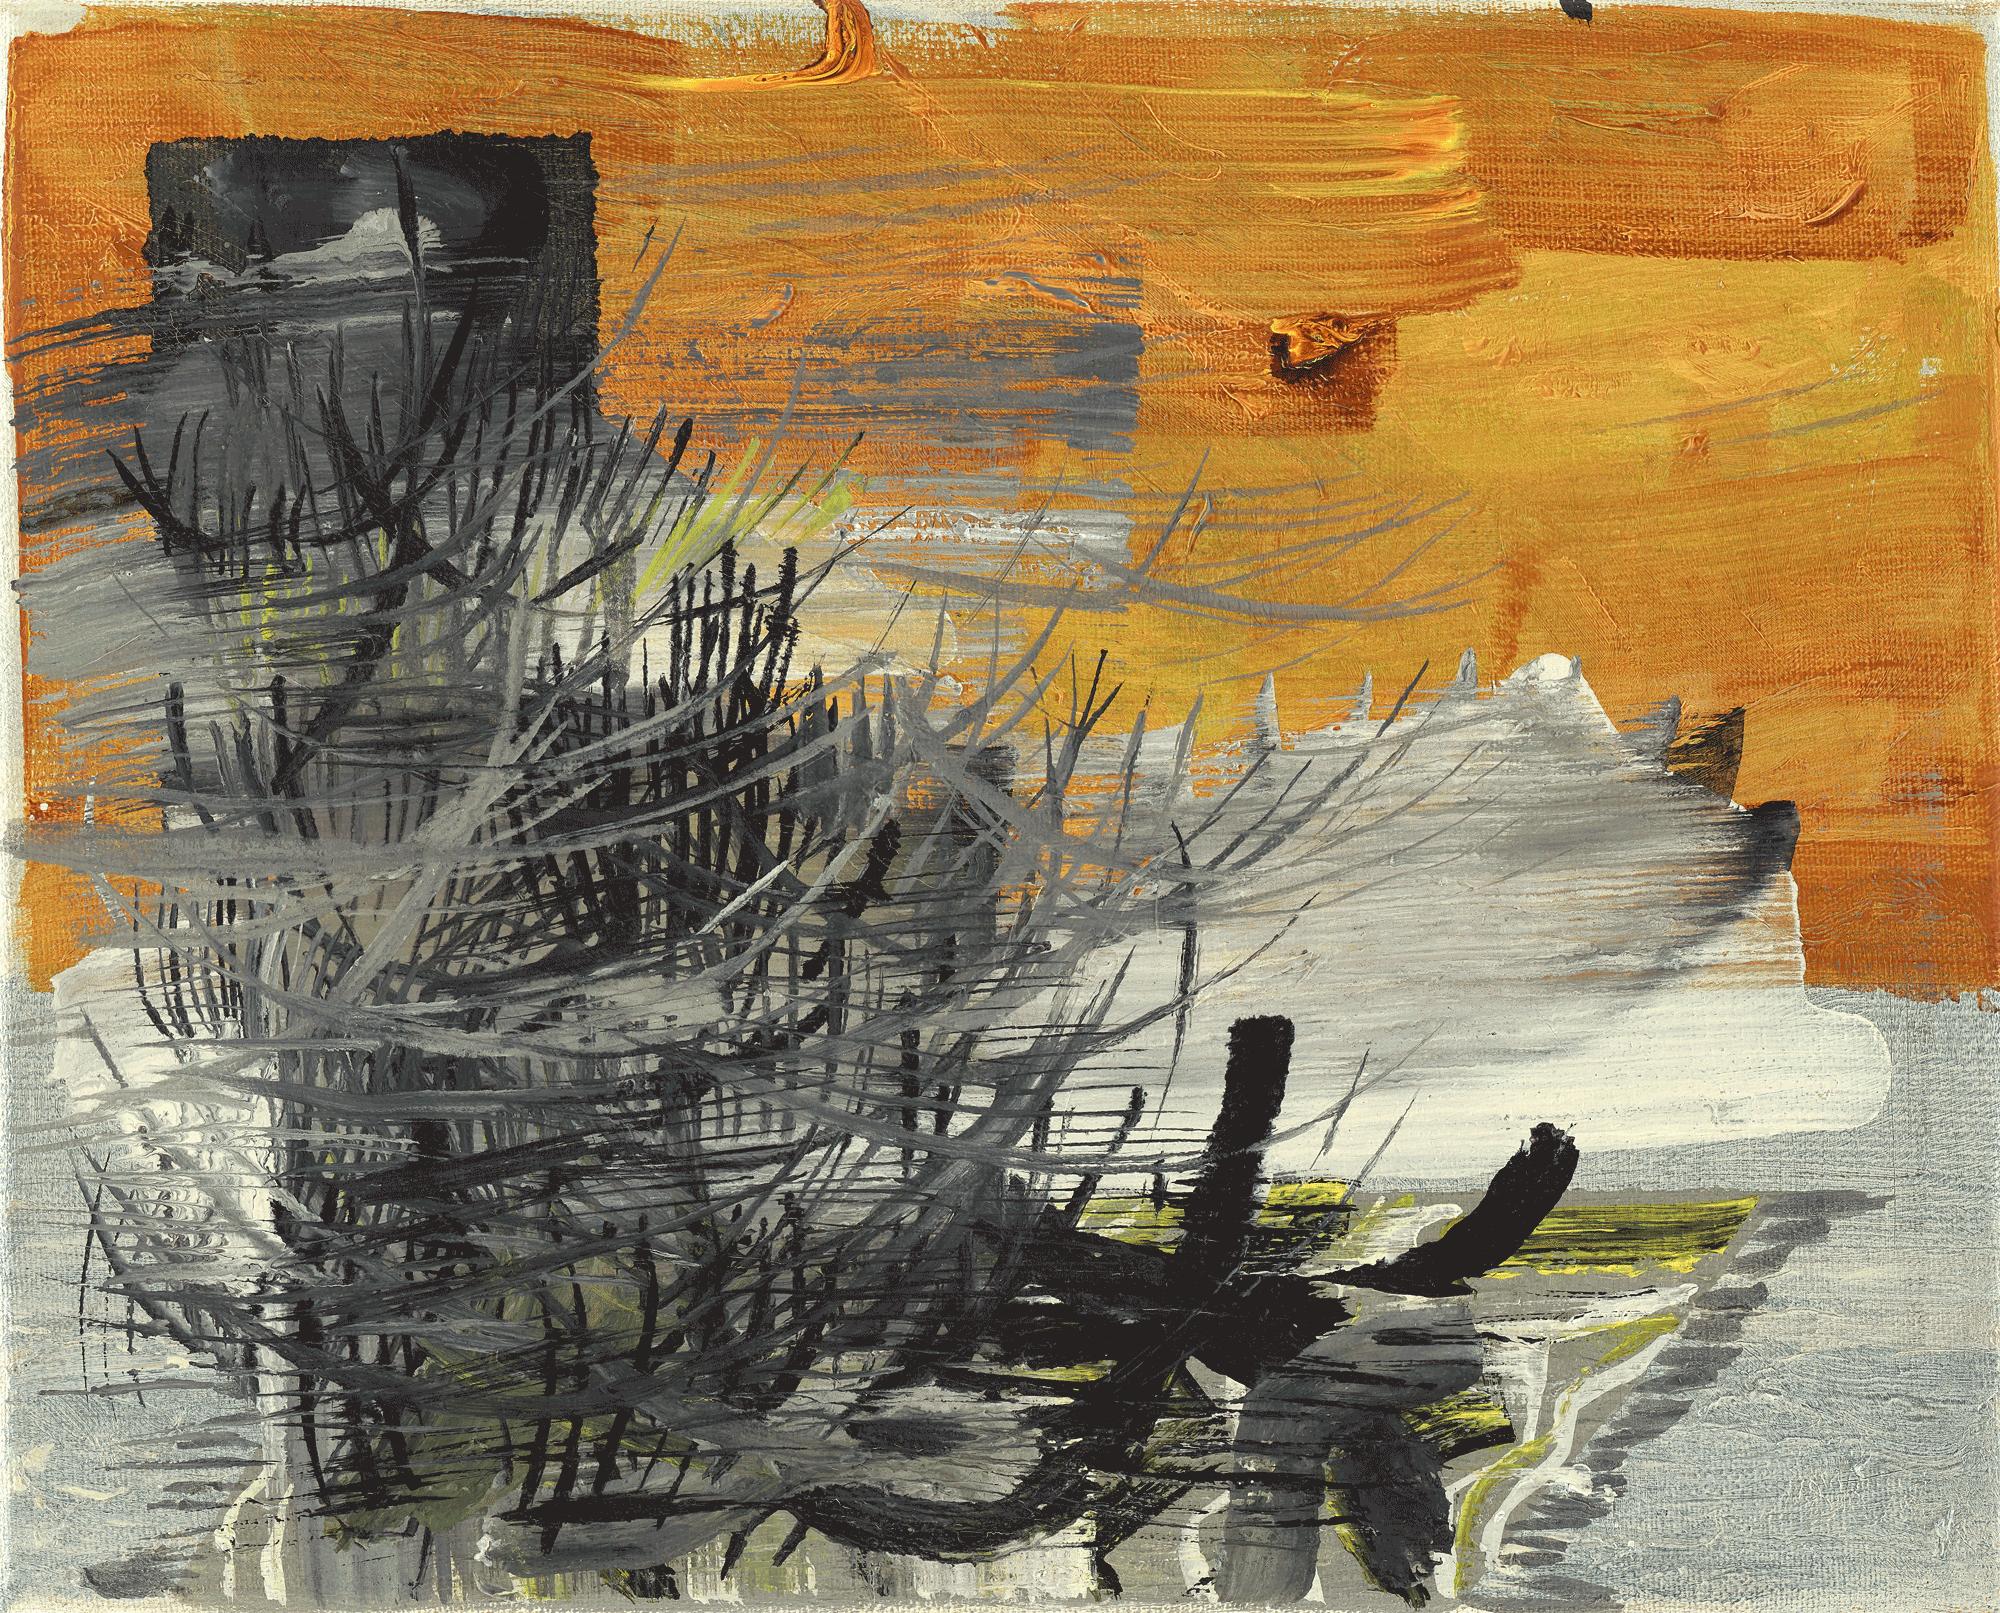 Yvonne Andreini, Insideout Teppich II, 2021, 24 x 30 cm, Tusche und Acryl auf Leinwand